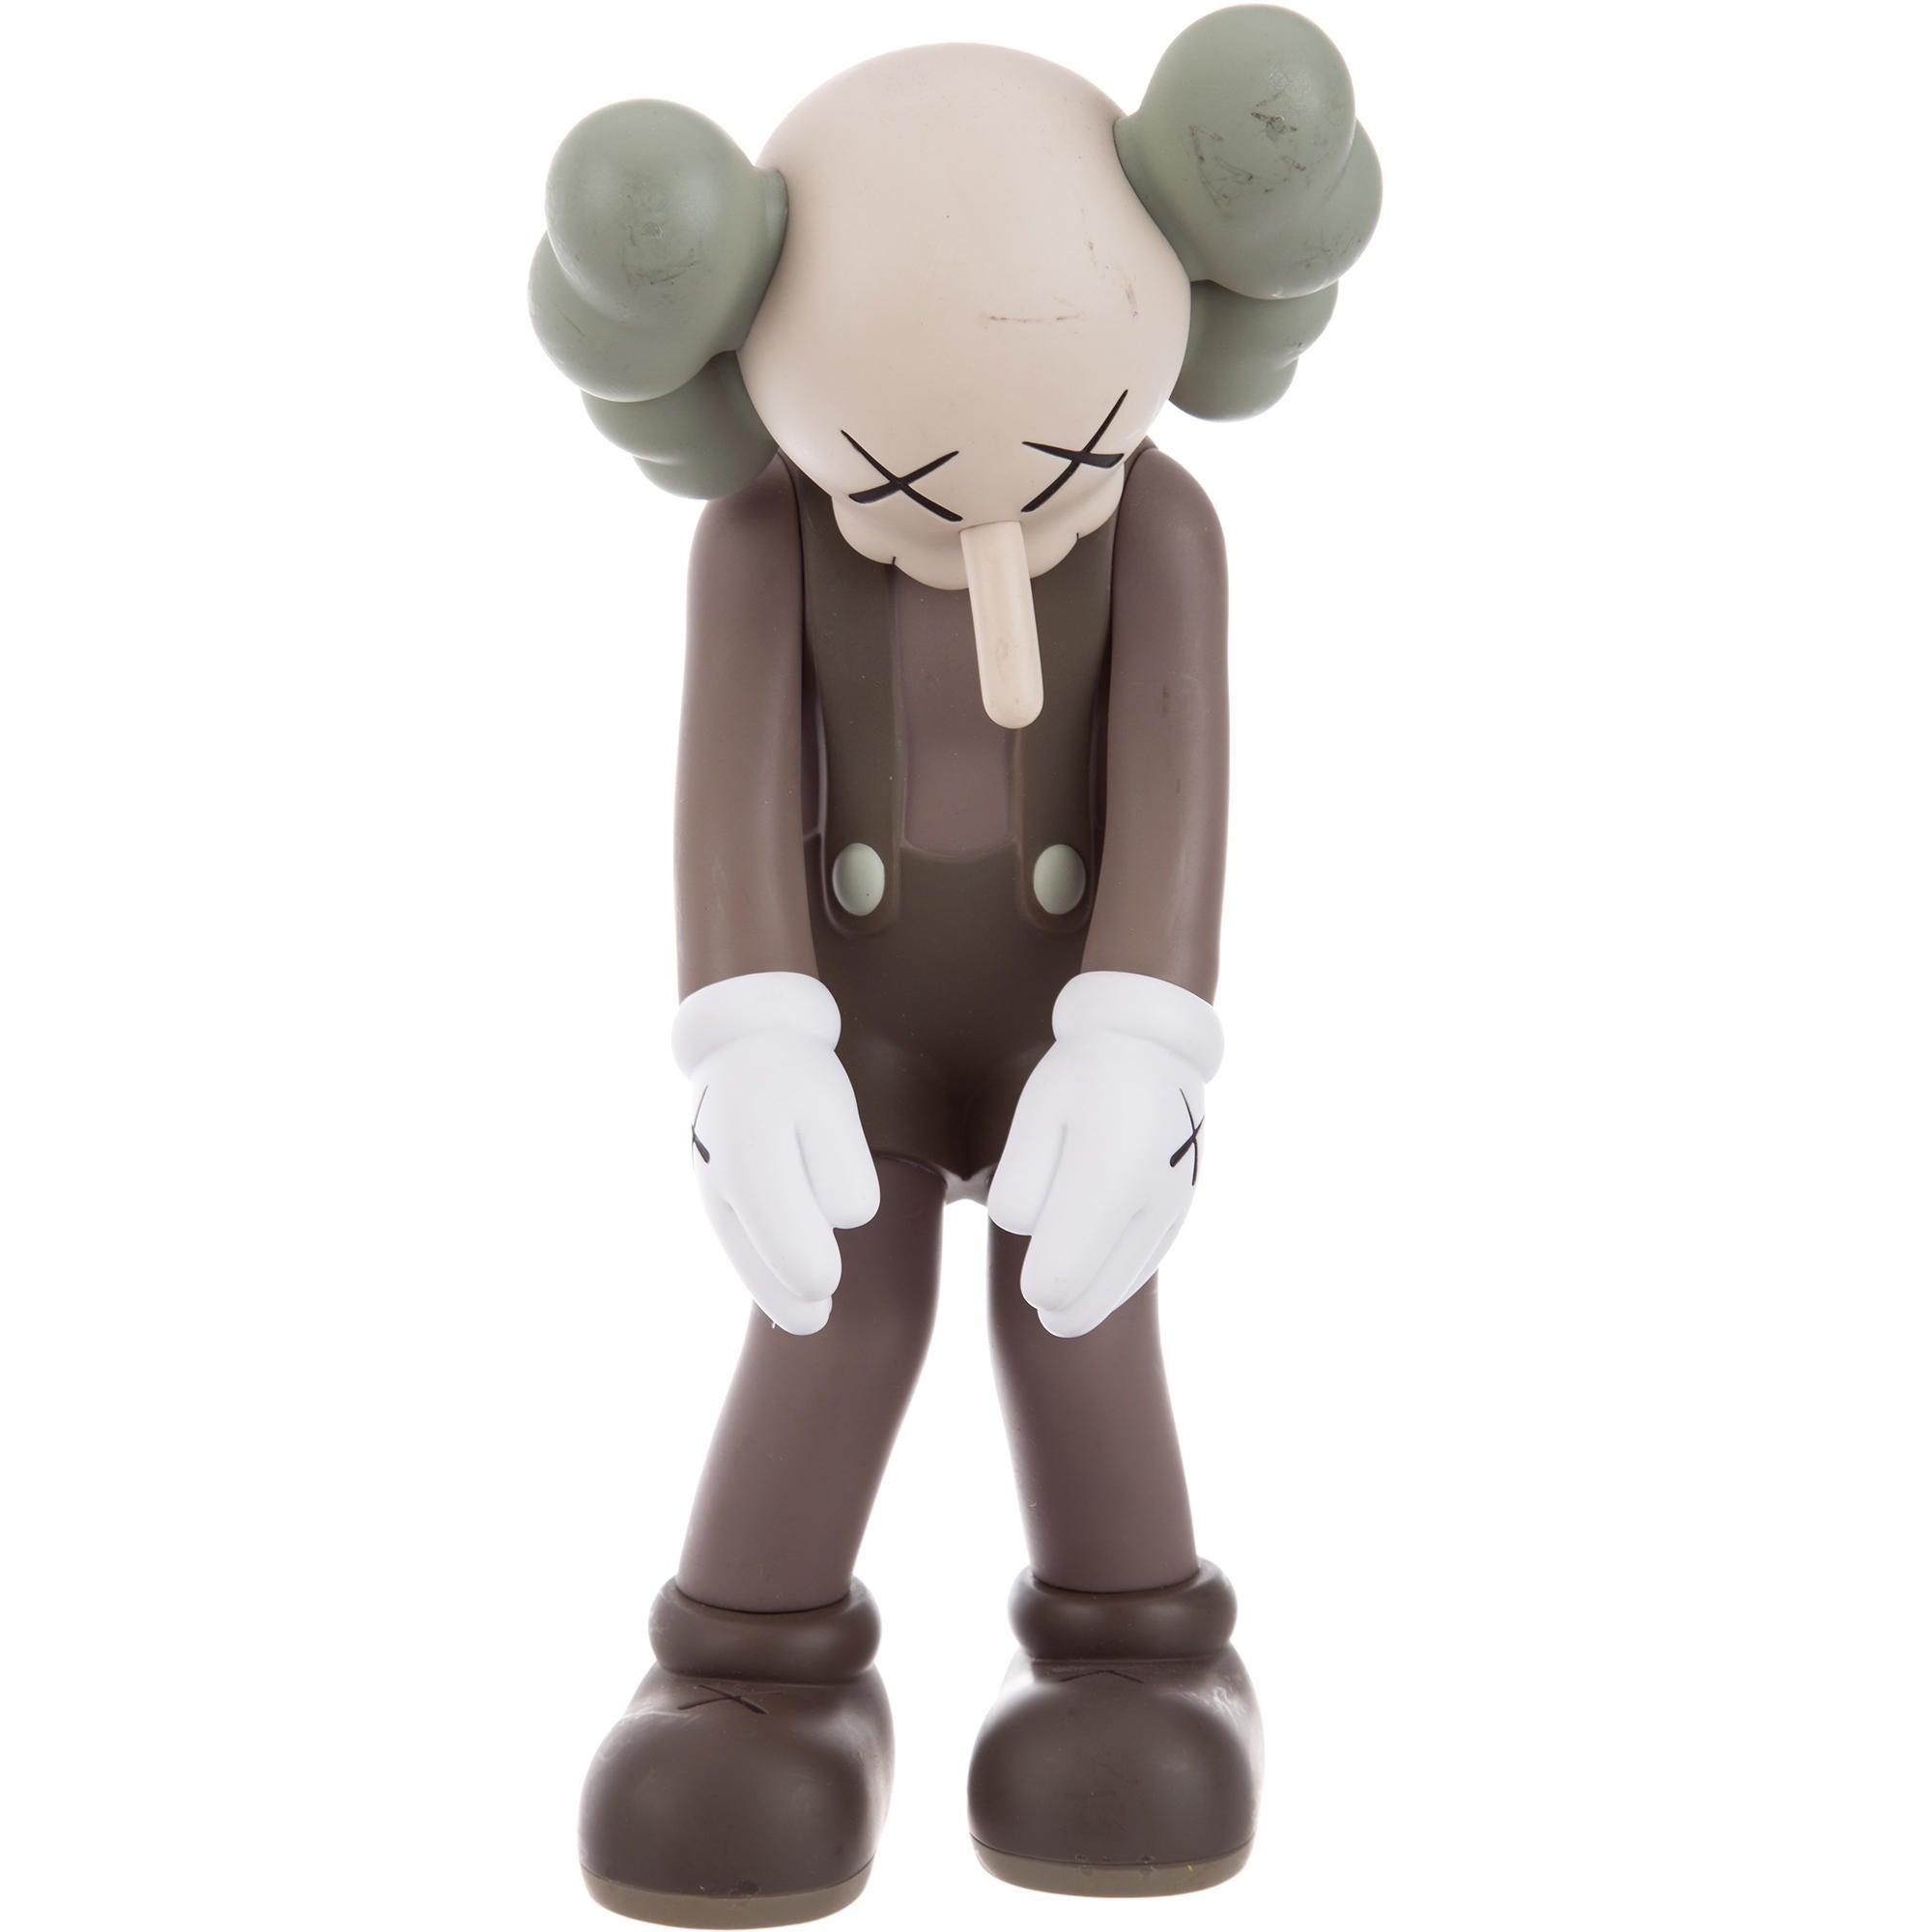 orig KAWS Medicom Toy Small Lie BROWN Limited Edition Companion Vinyl 2017